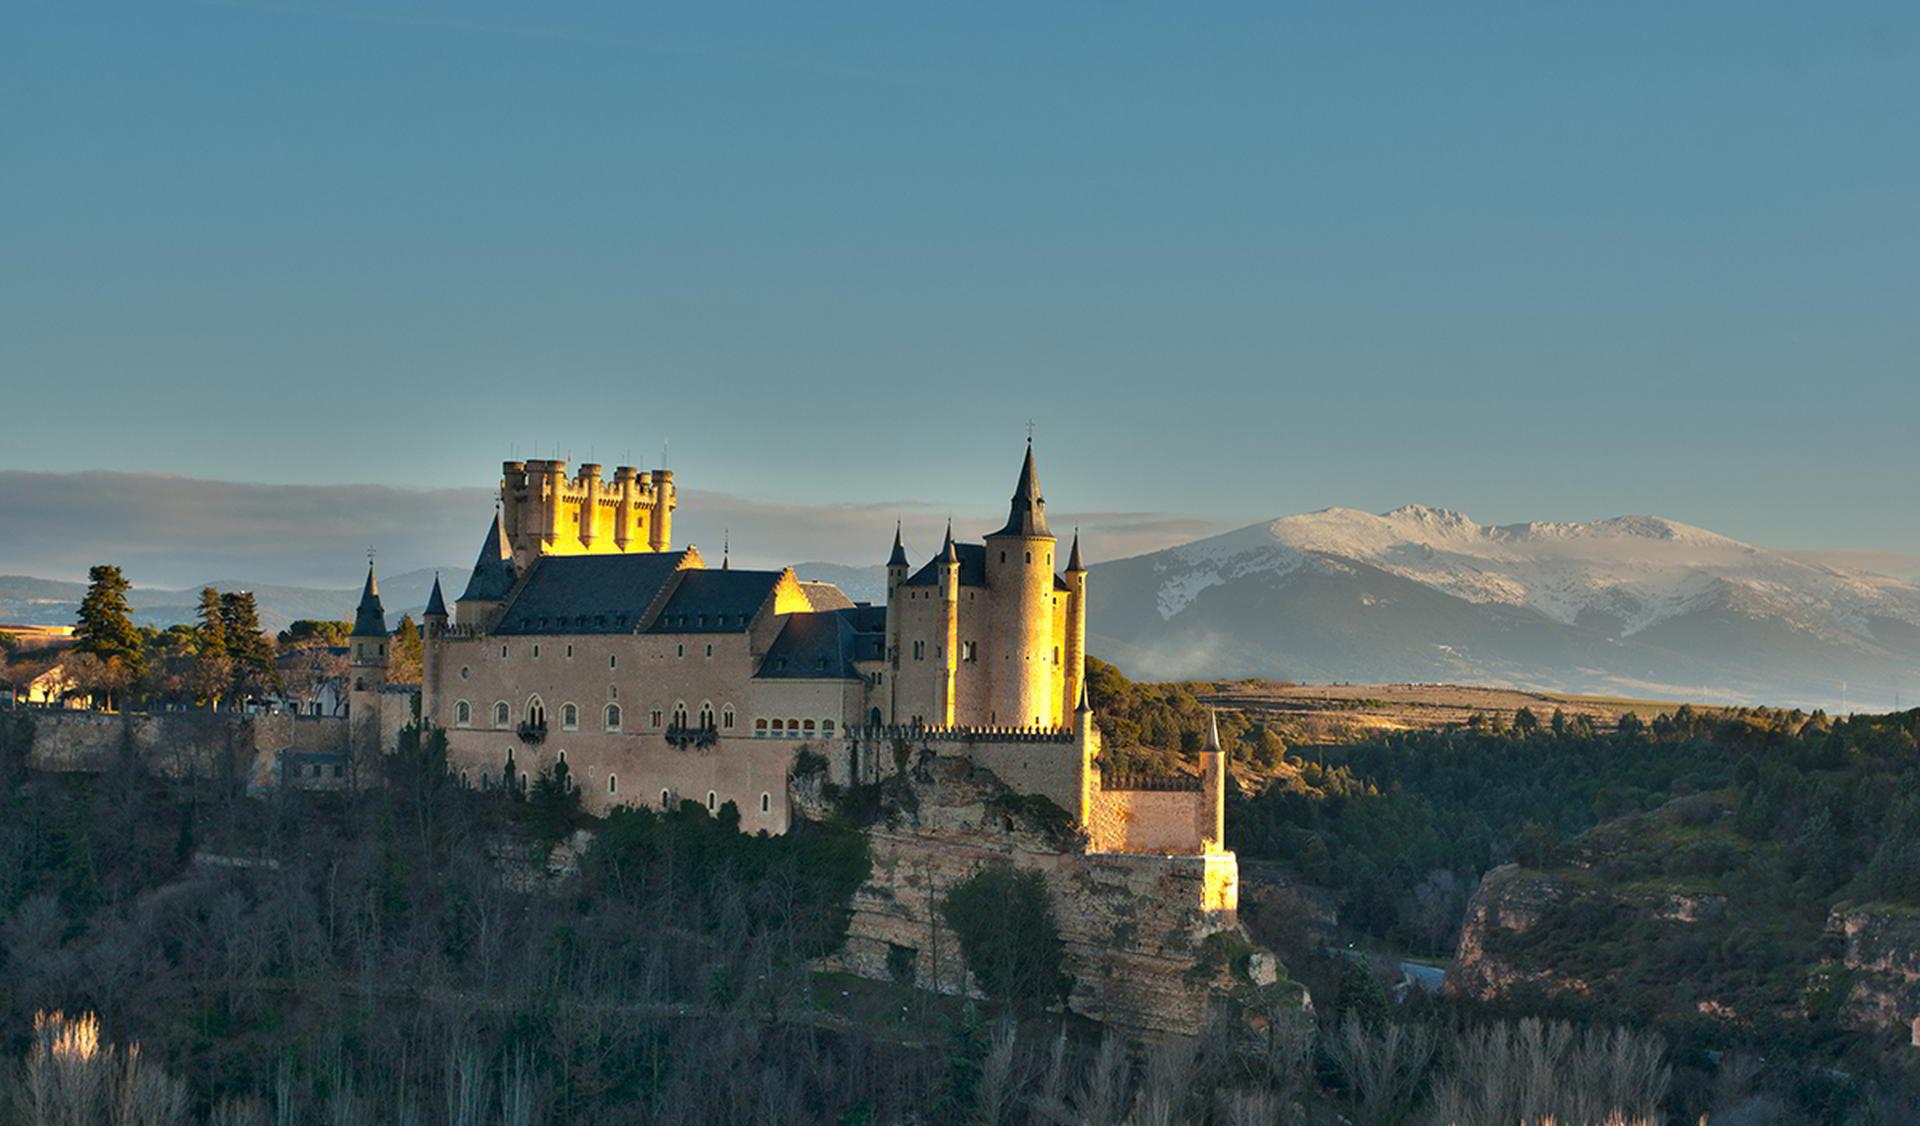 I castelli medievali più belli d'Europa: Alcázar di Segovia